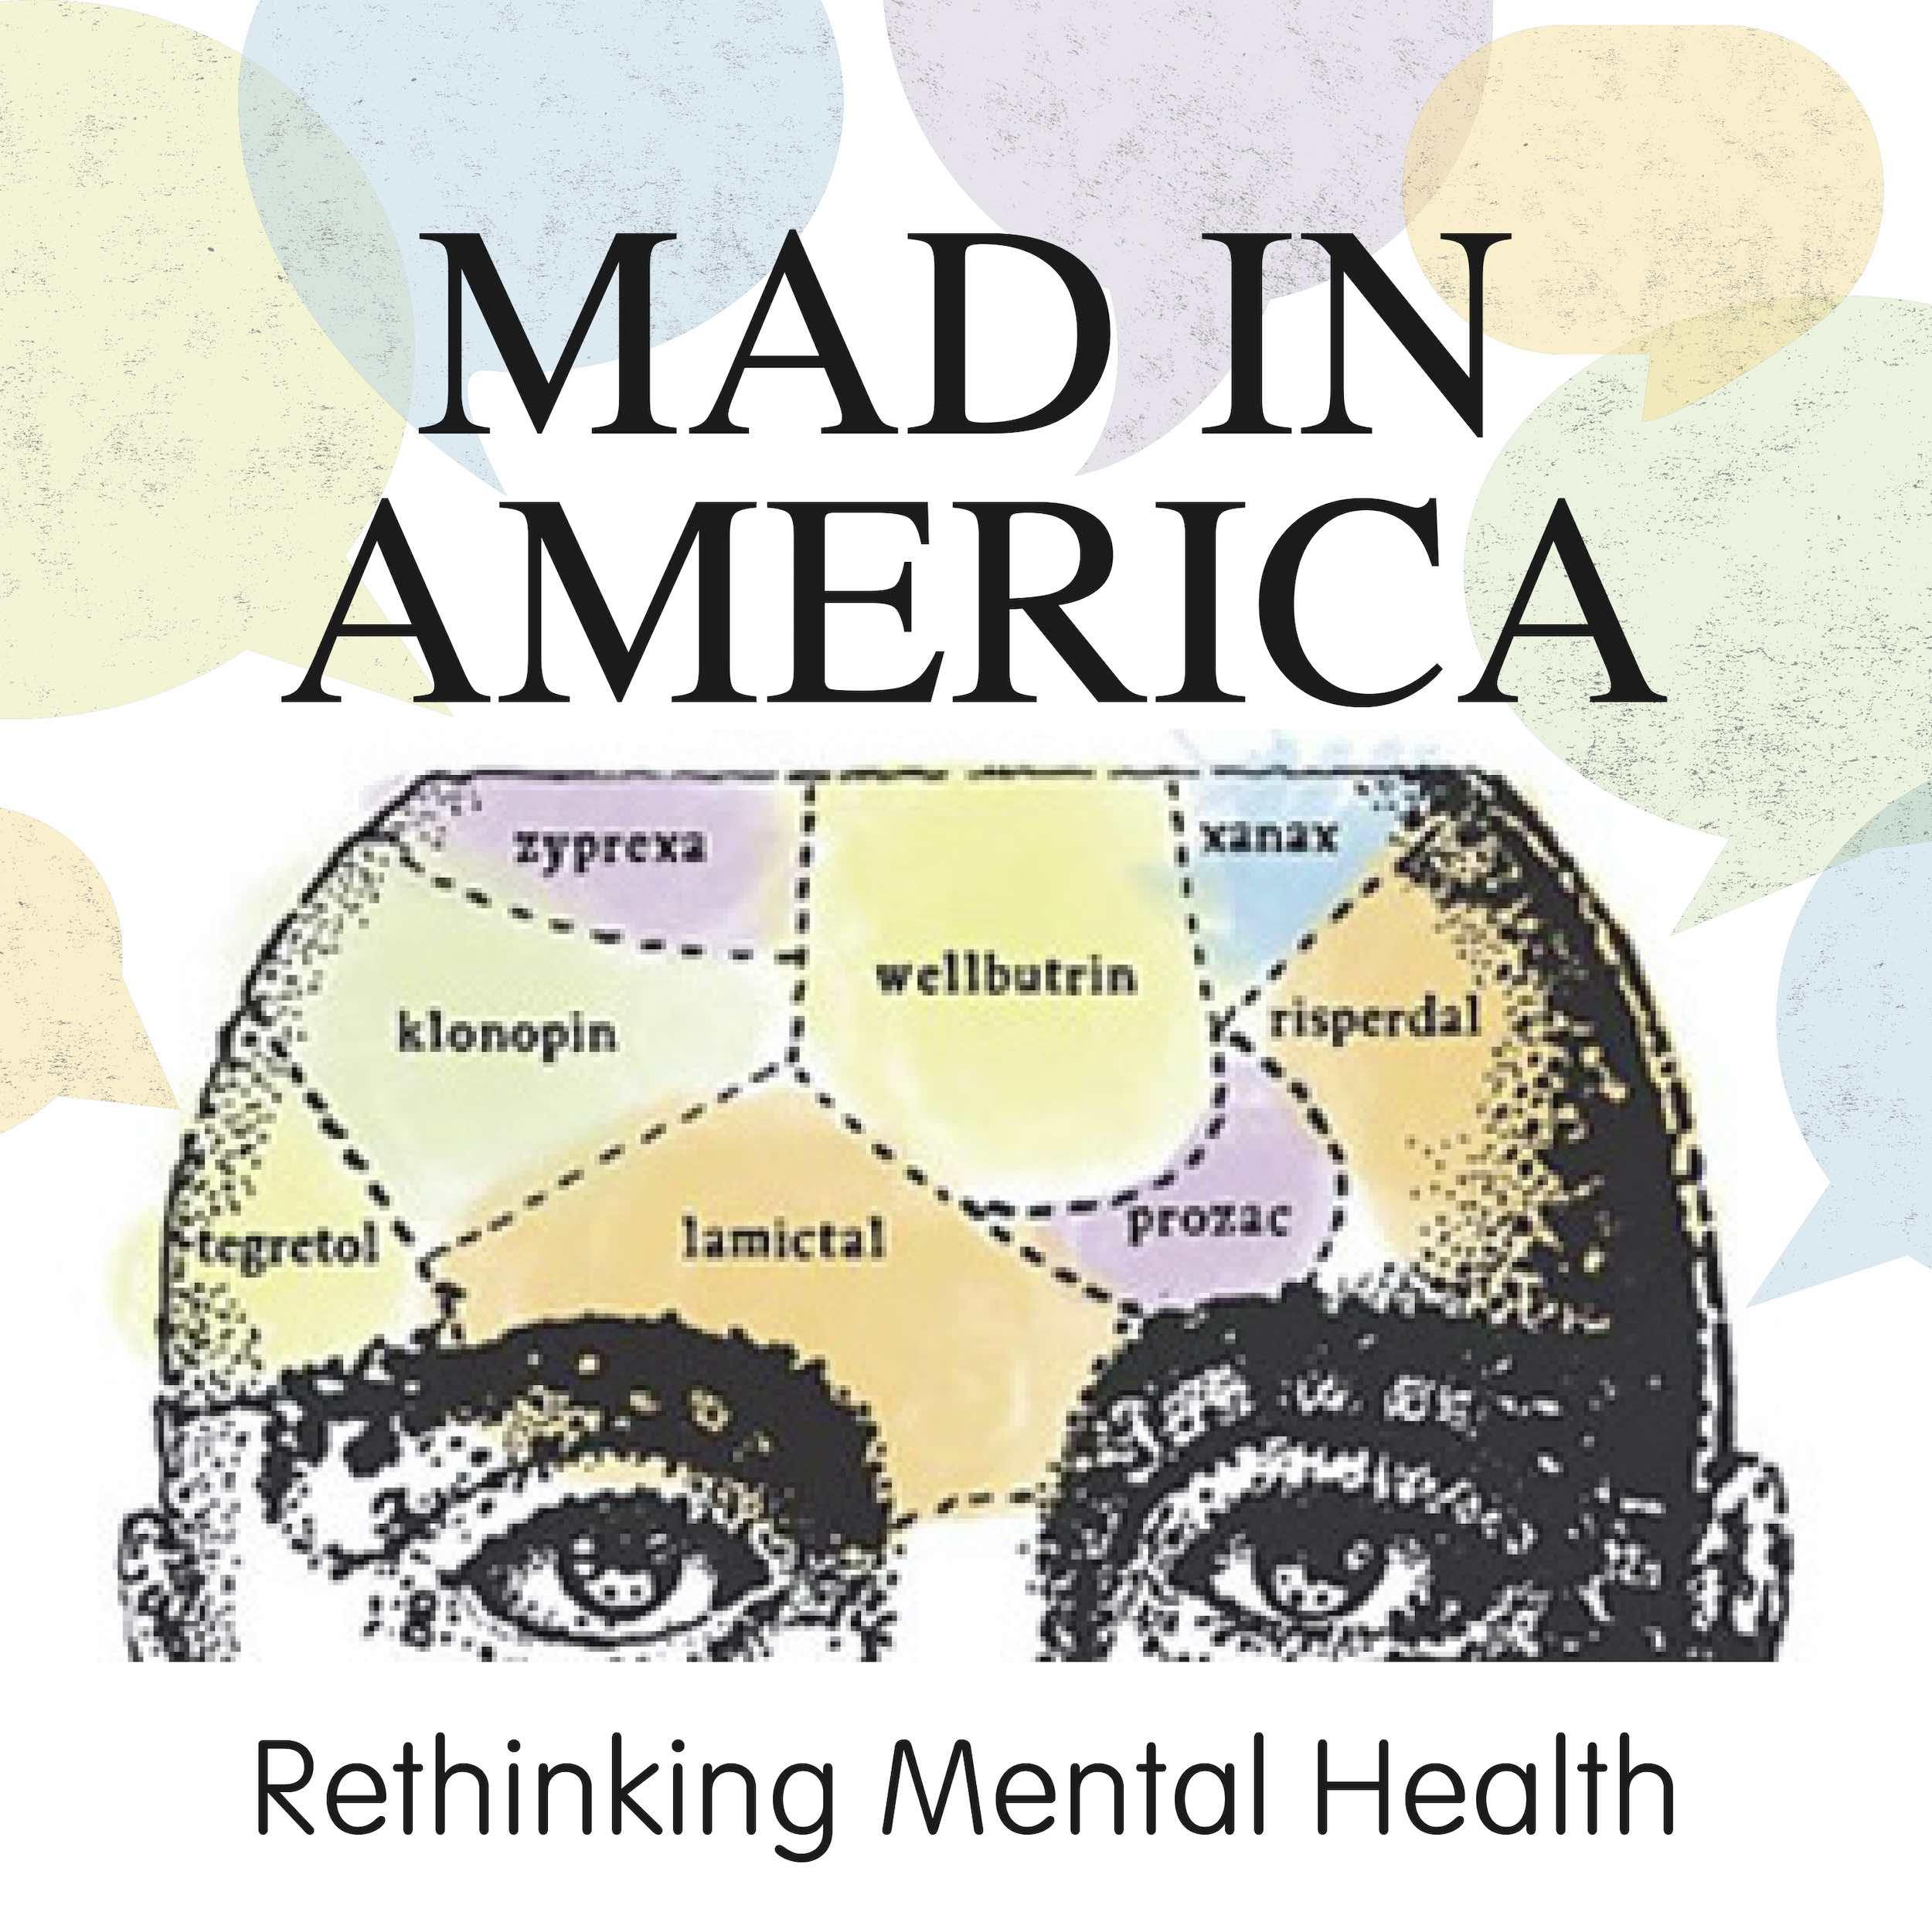 Mad in America: Rethinking Mental Health - Adele Framer - Surviving Antidepressants